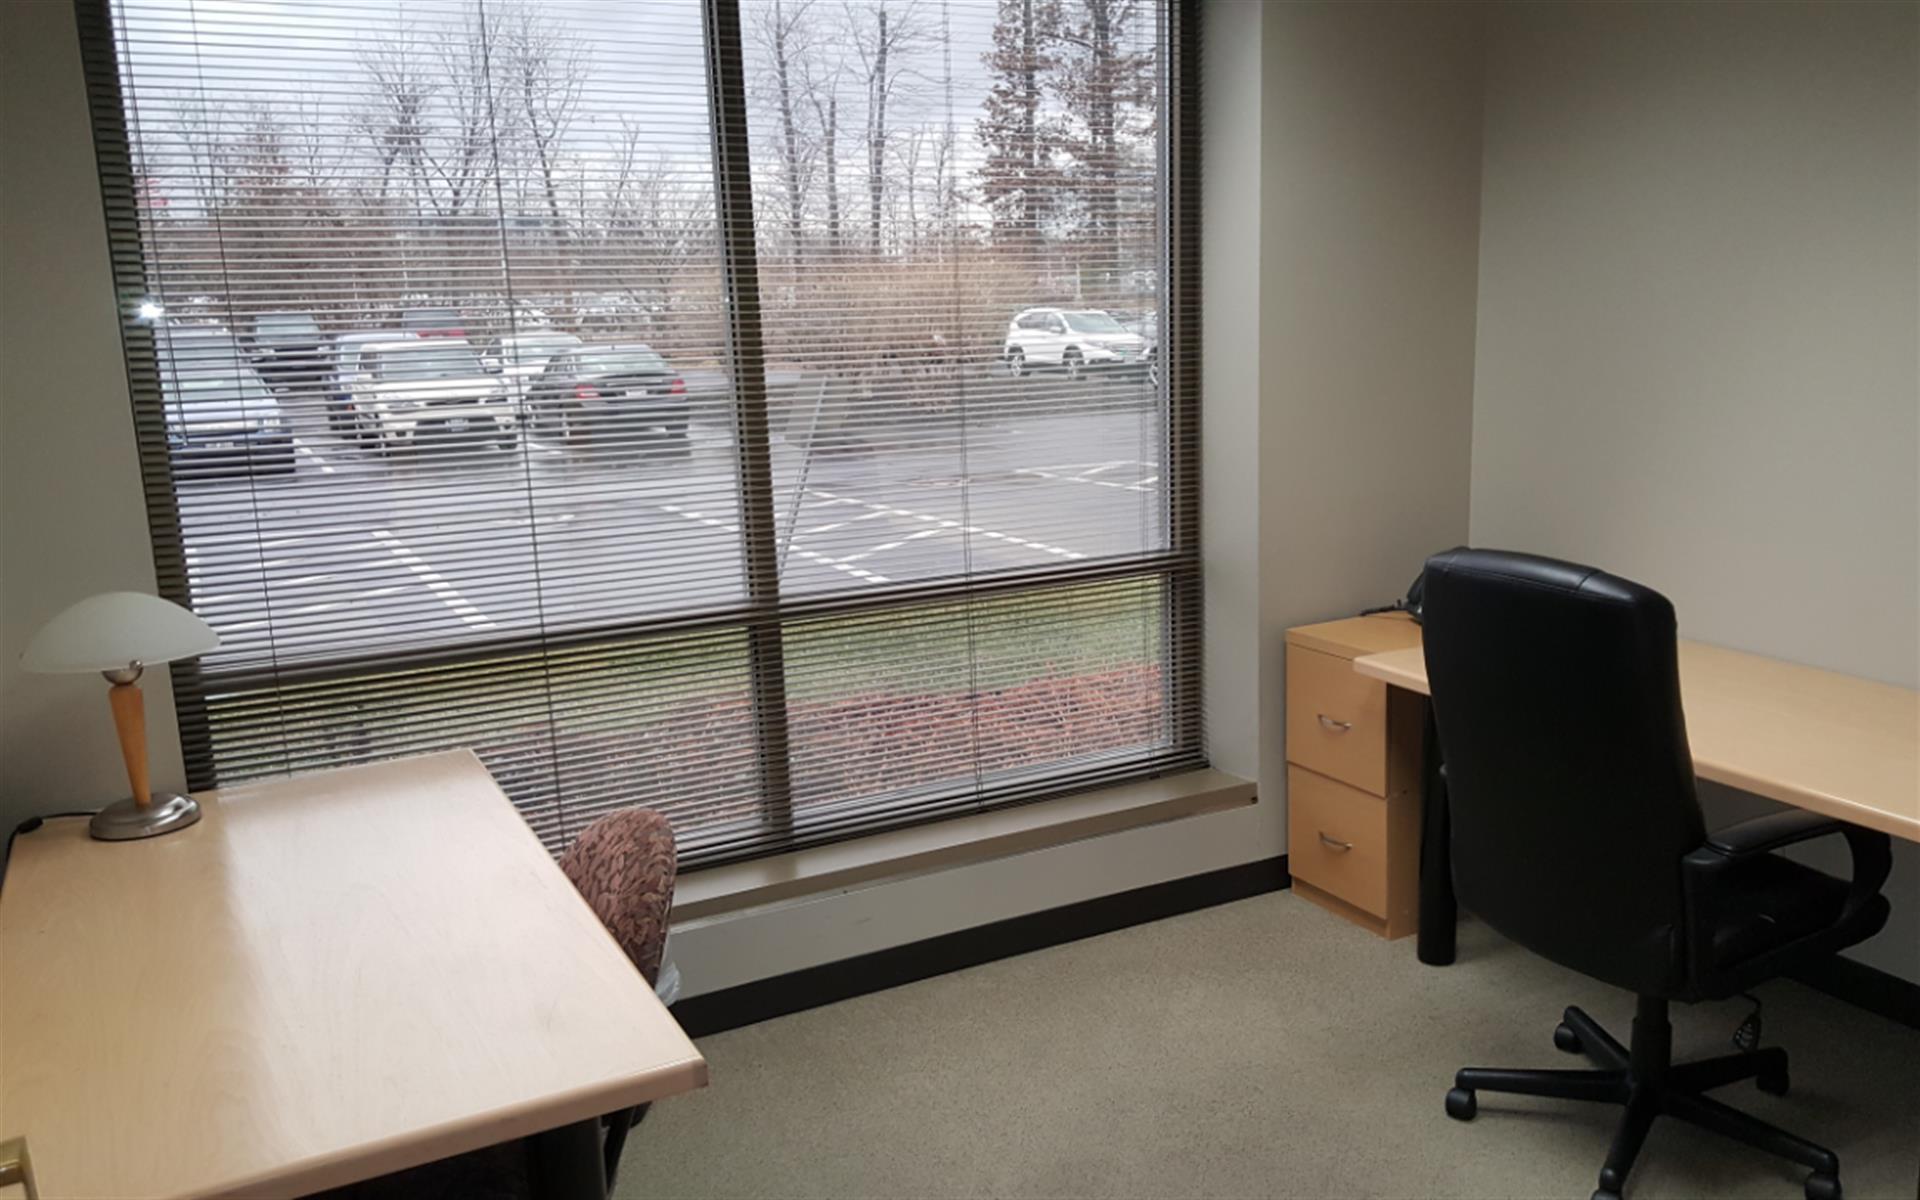 Intelligent Office Cincinnati - Mason - 1 to 2 person Window Office